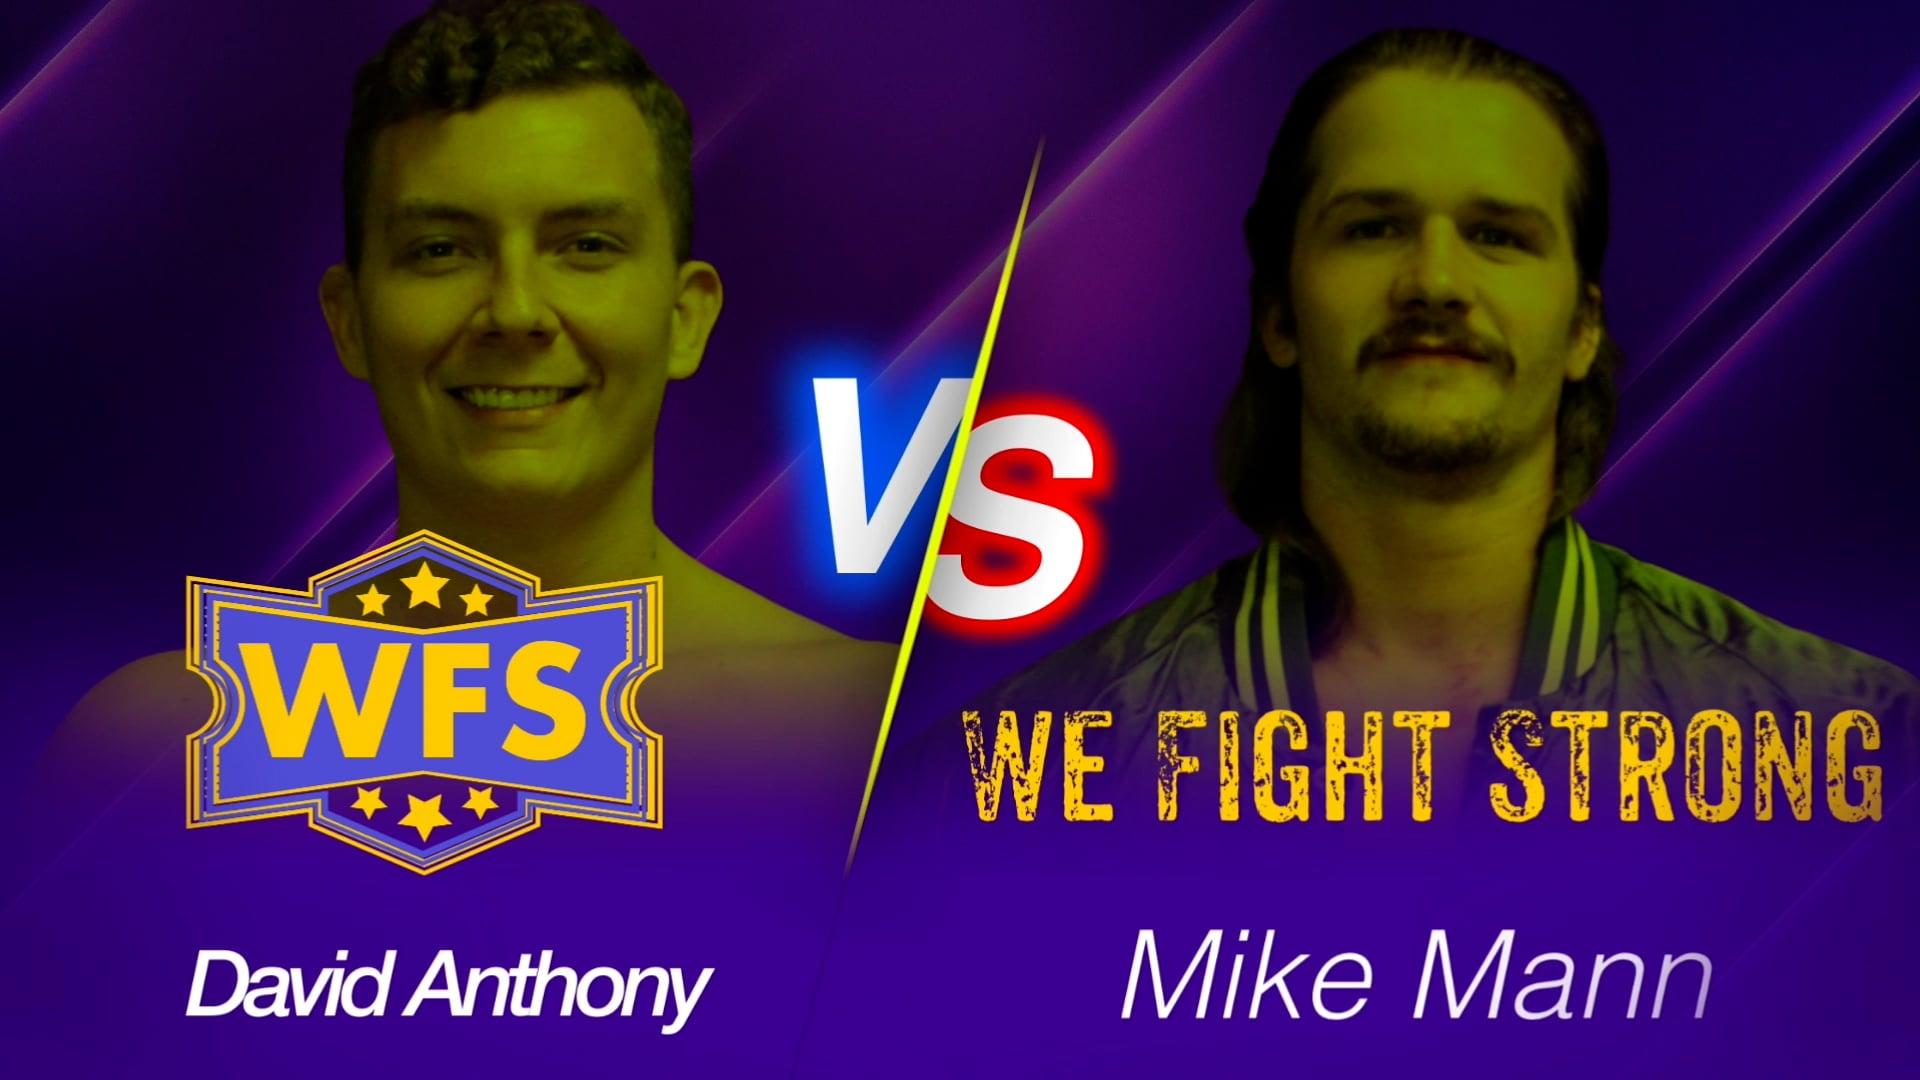 David Anthony vs. Mike Mann